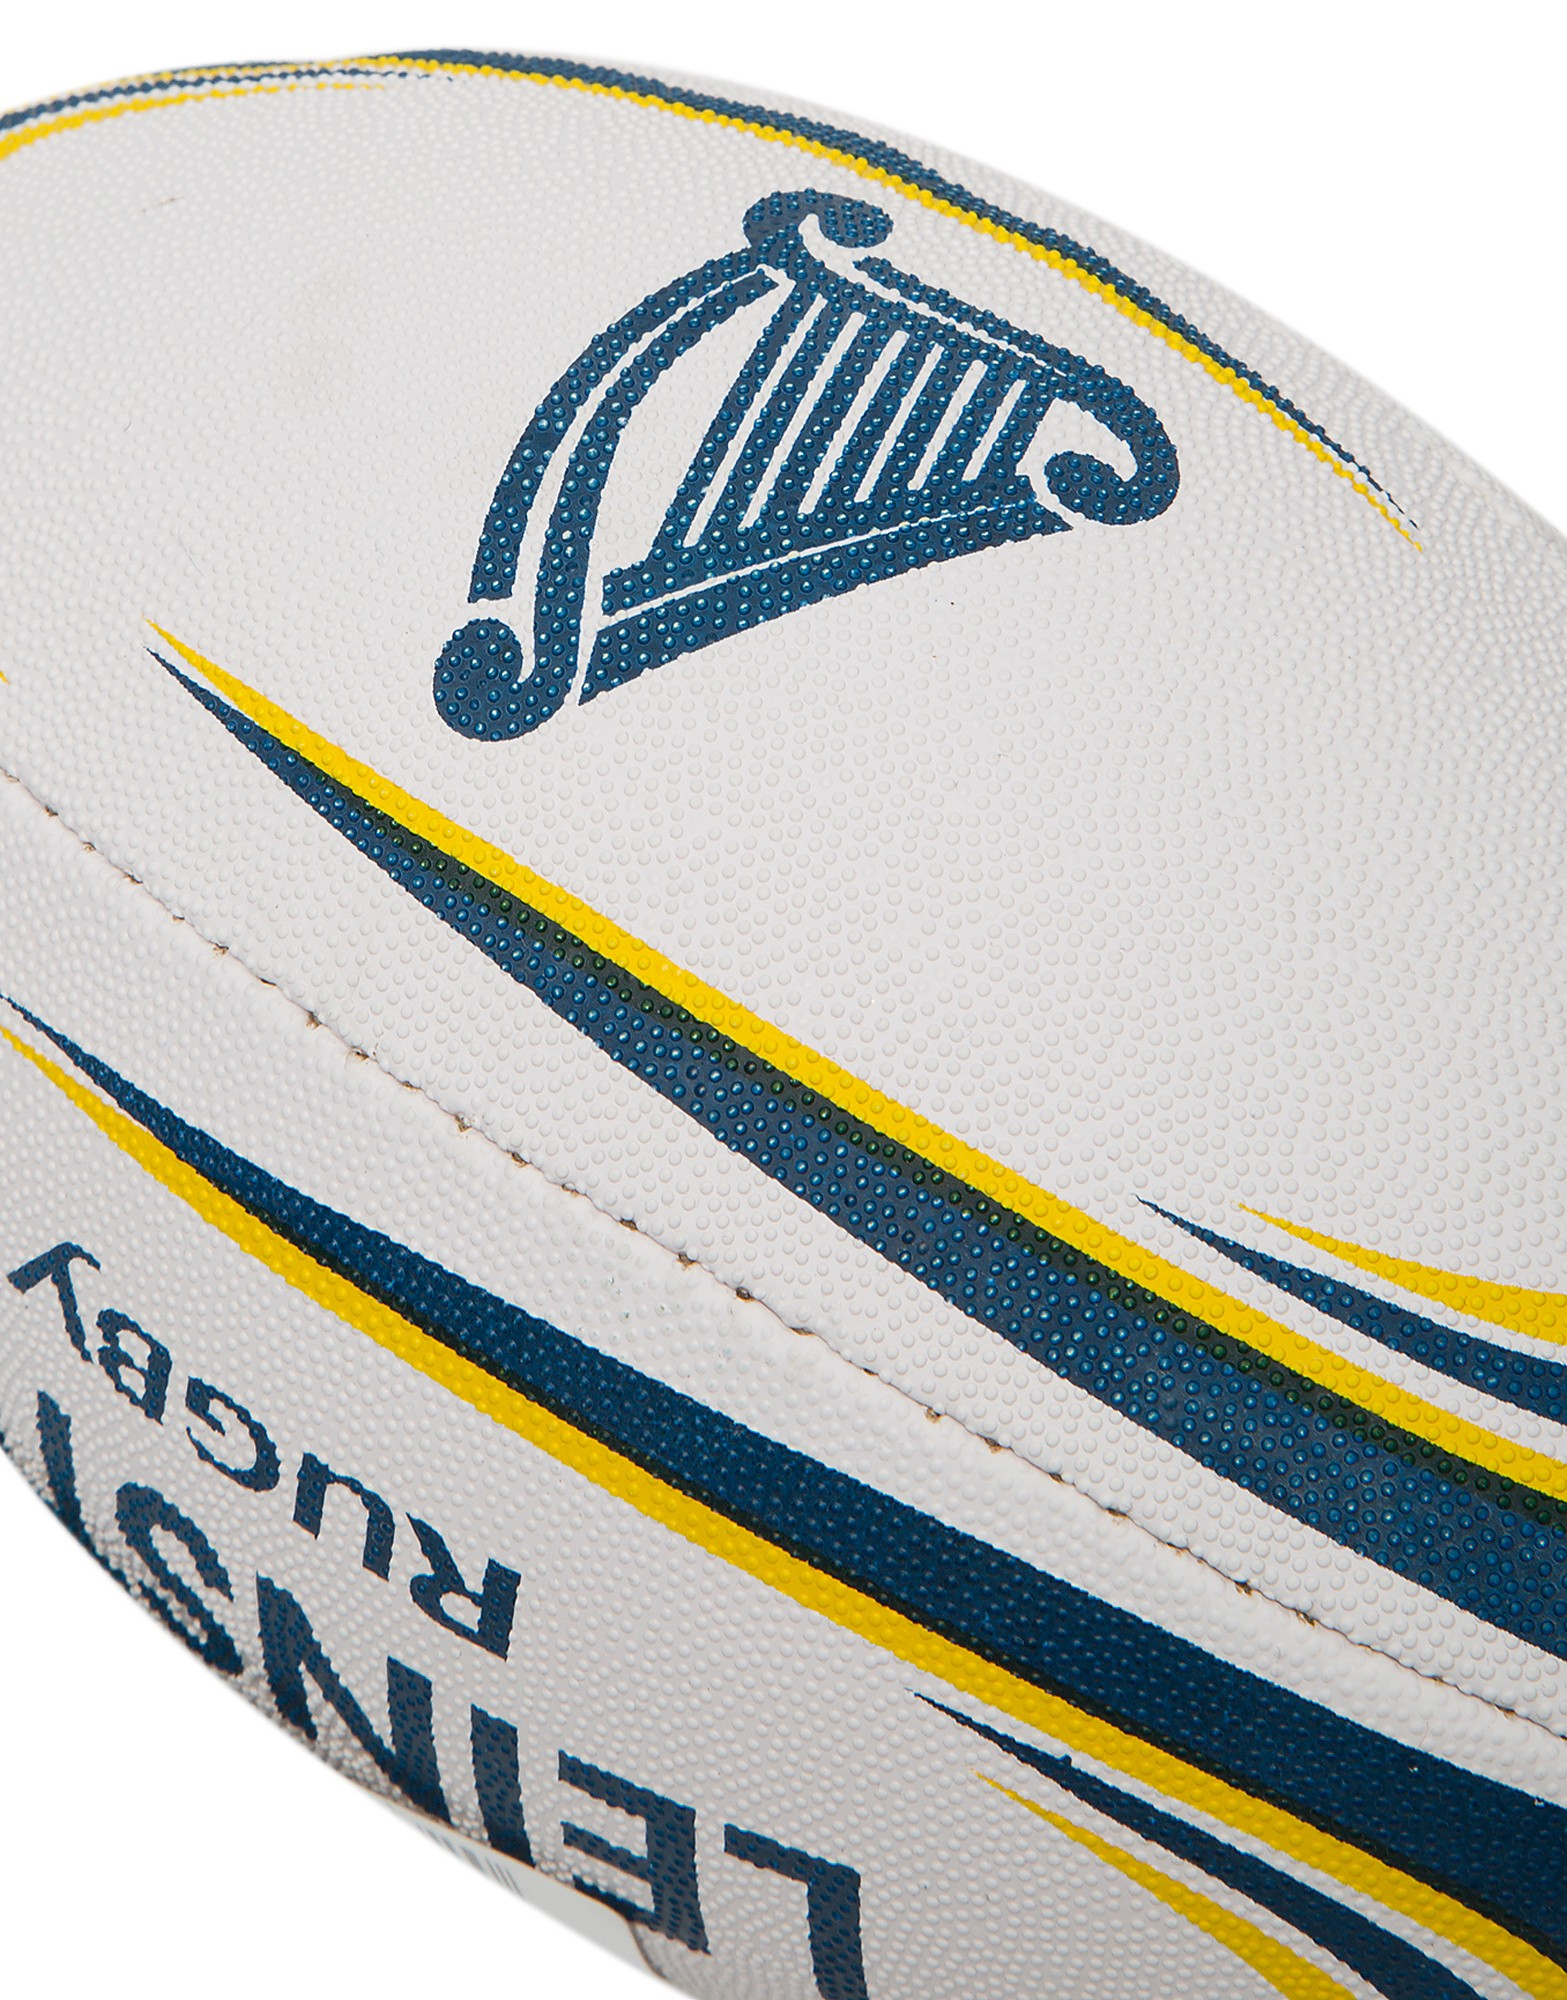 Daricia Leinster Mini Rugby Ball